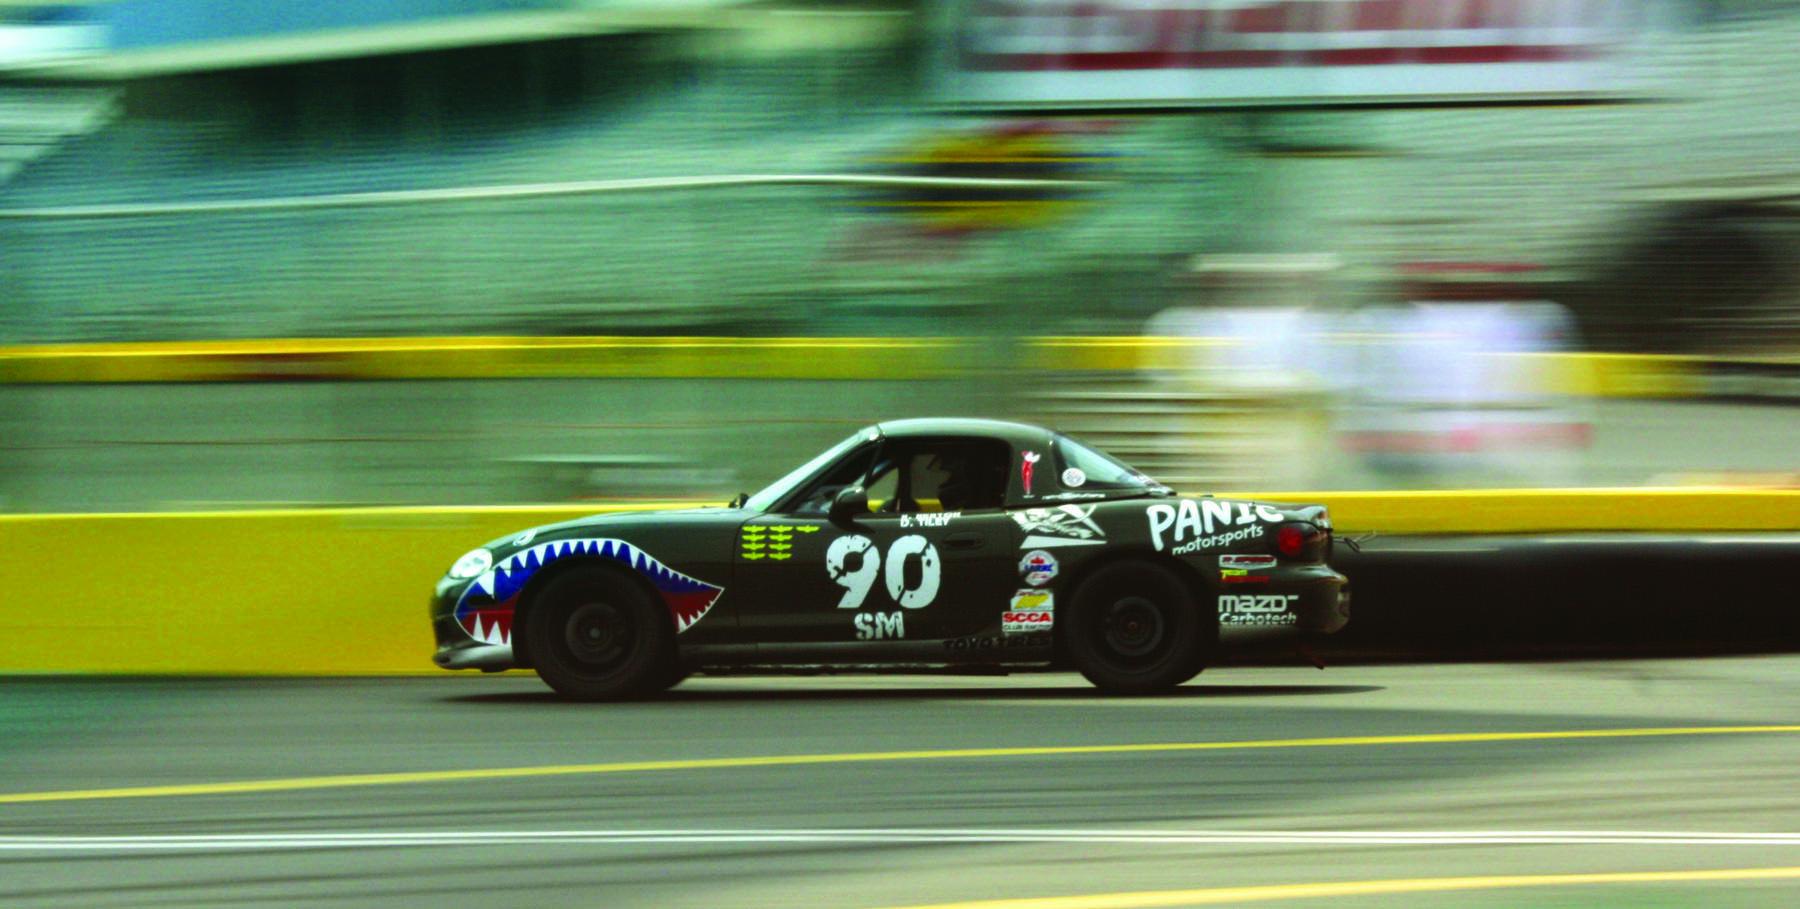 Panic Motorsports' original P40 Spec Miata